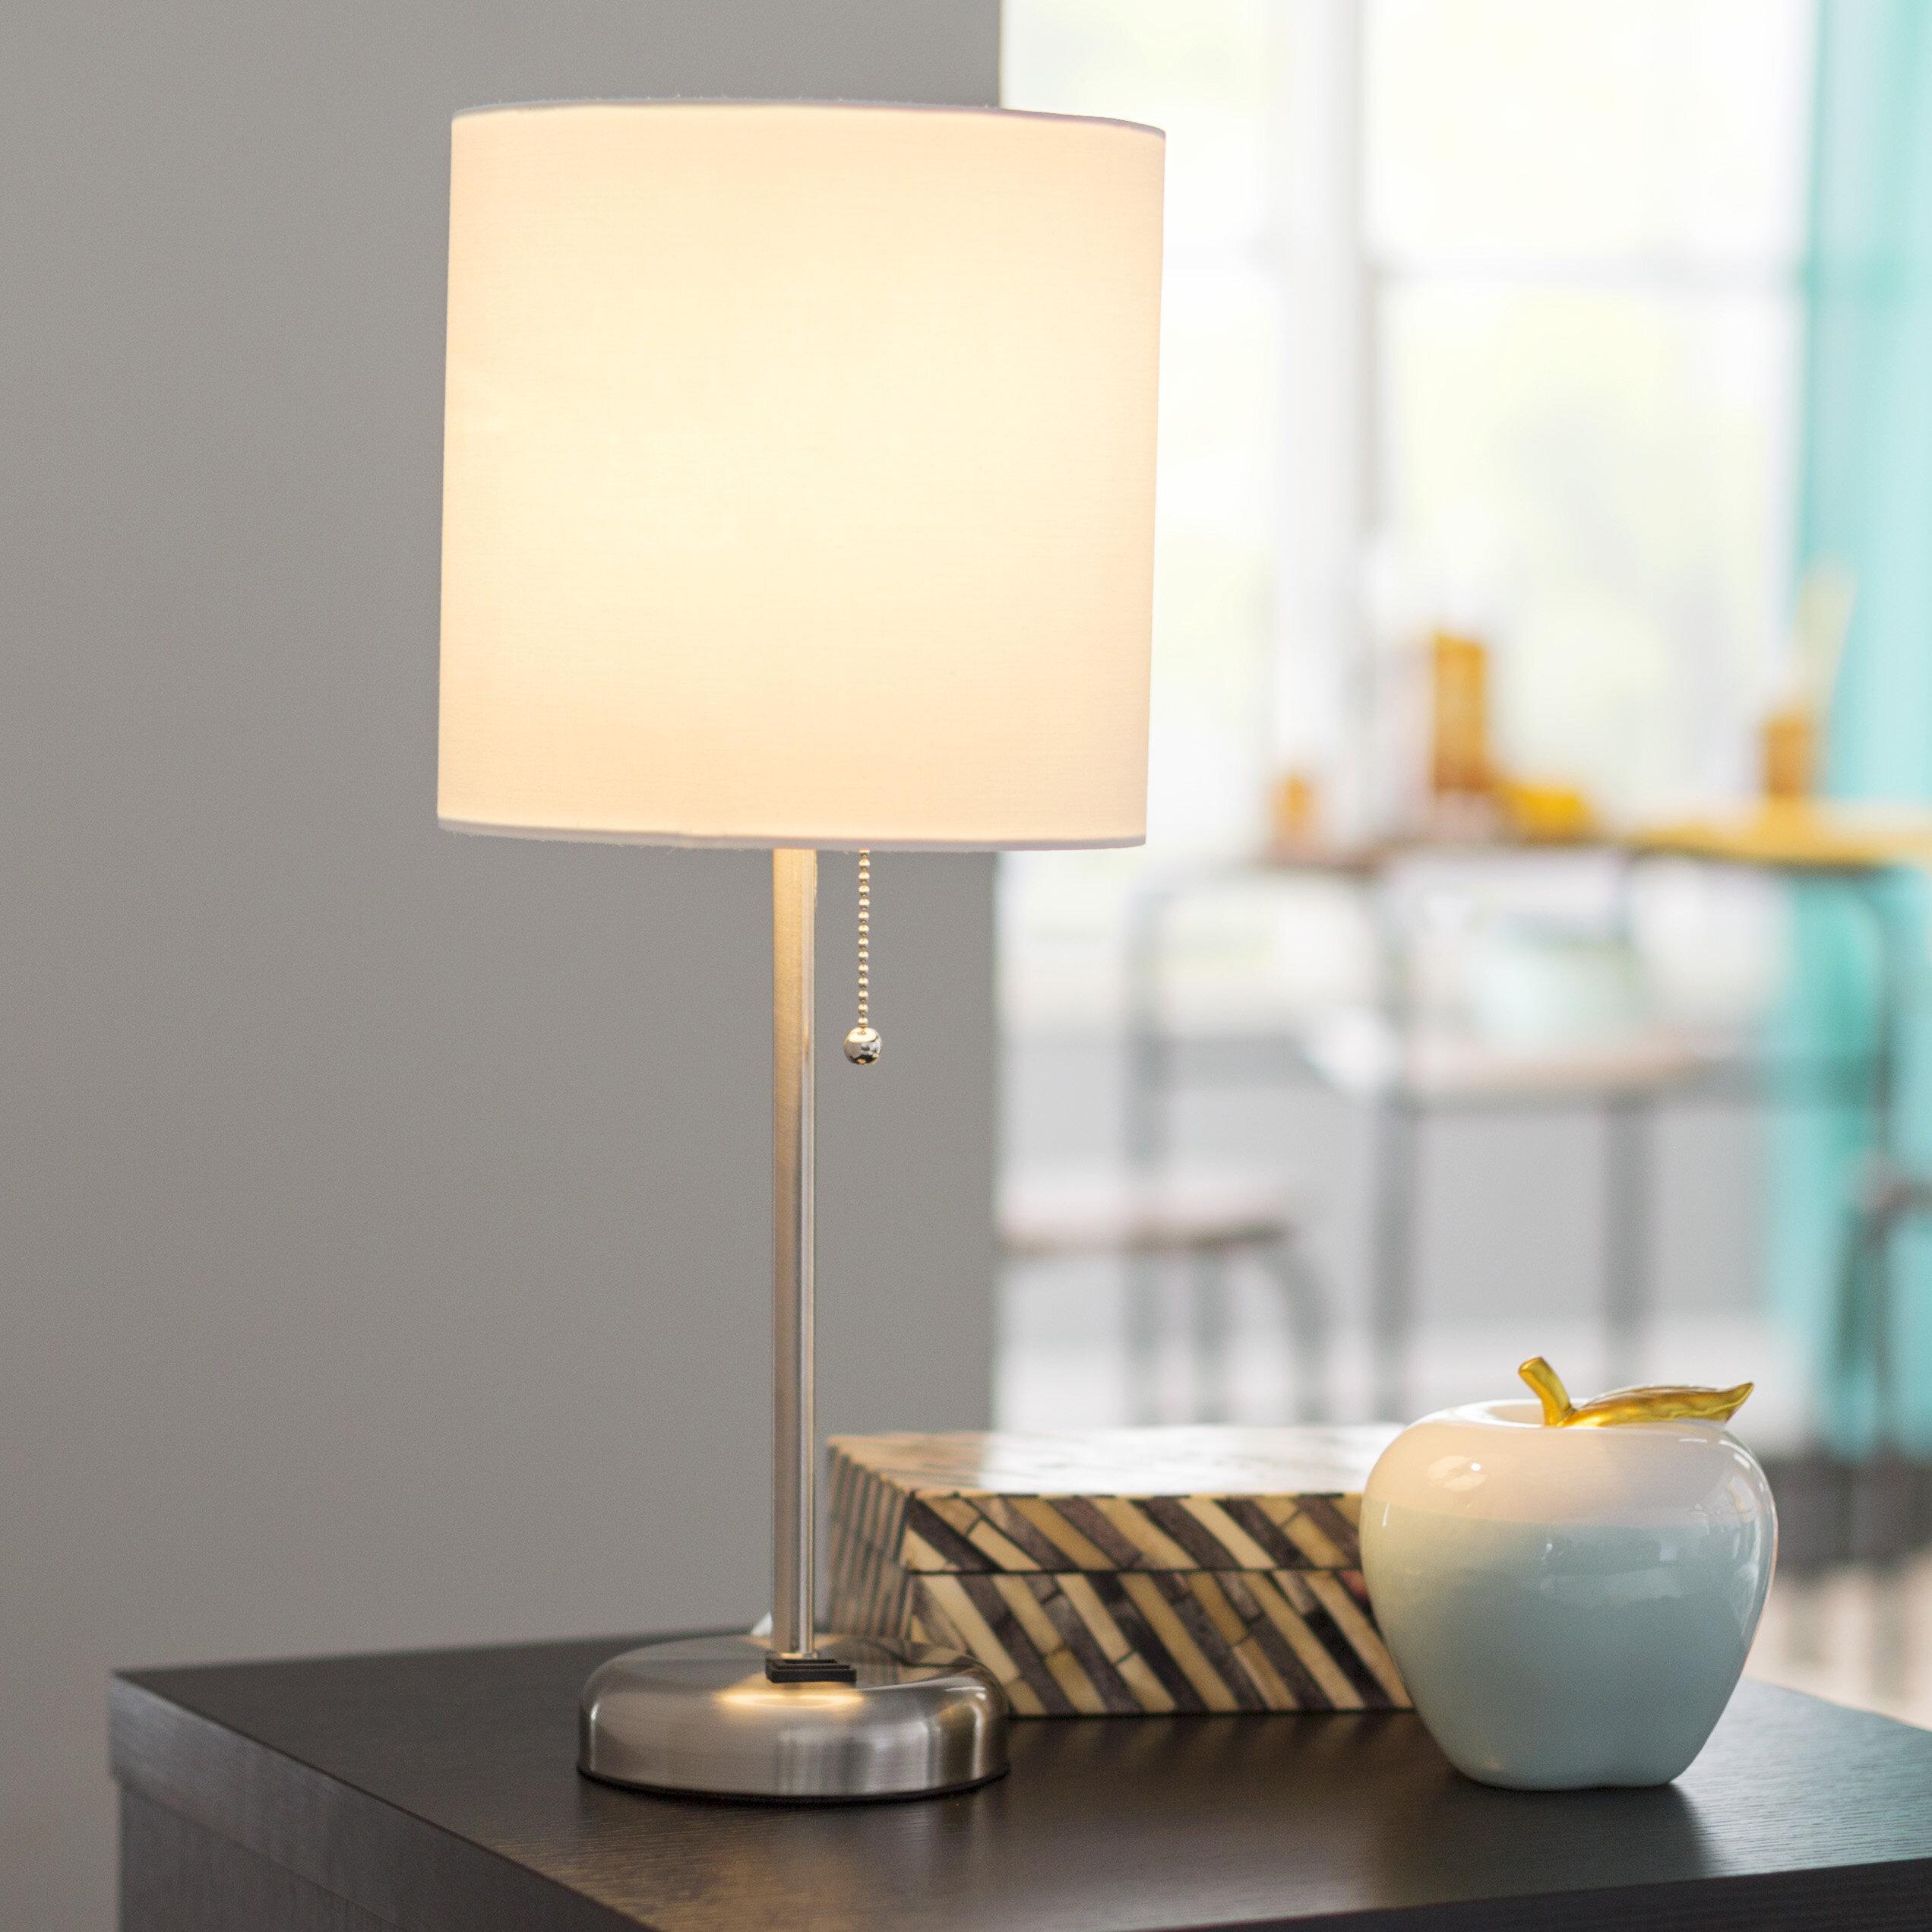 Zipcode design zainab 195 table lamp reviews wayfair greentooth Gallery